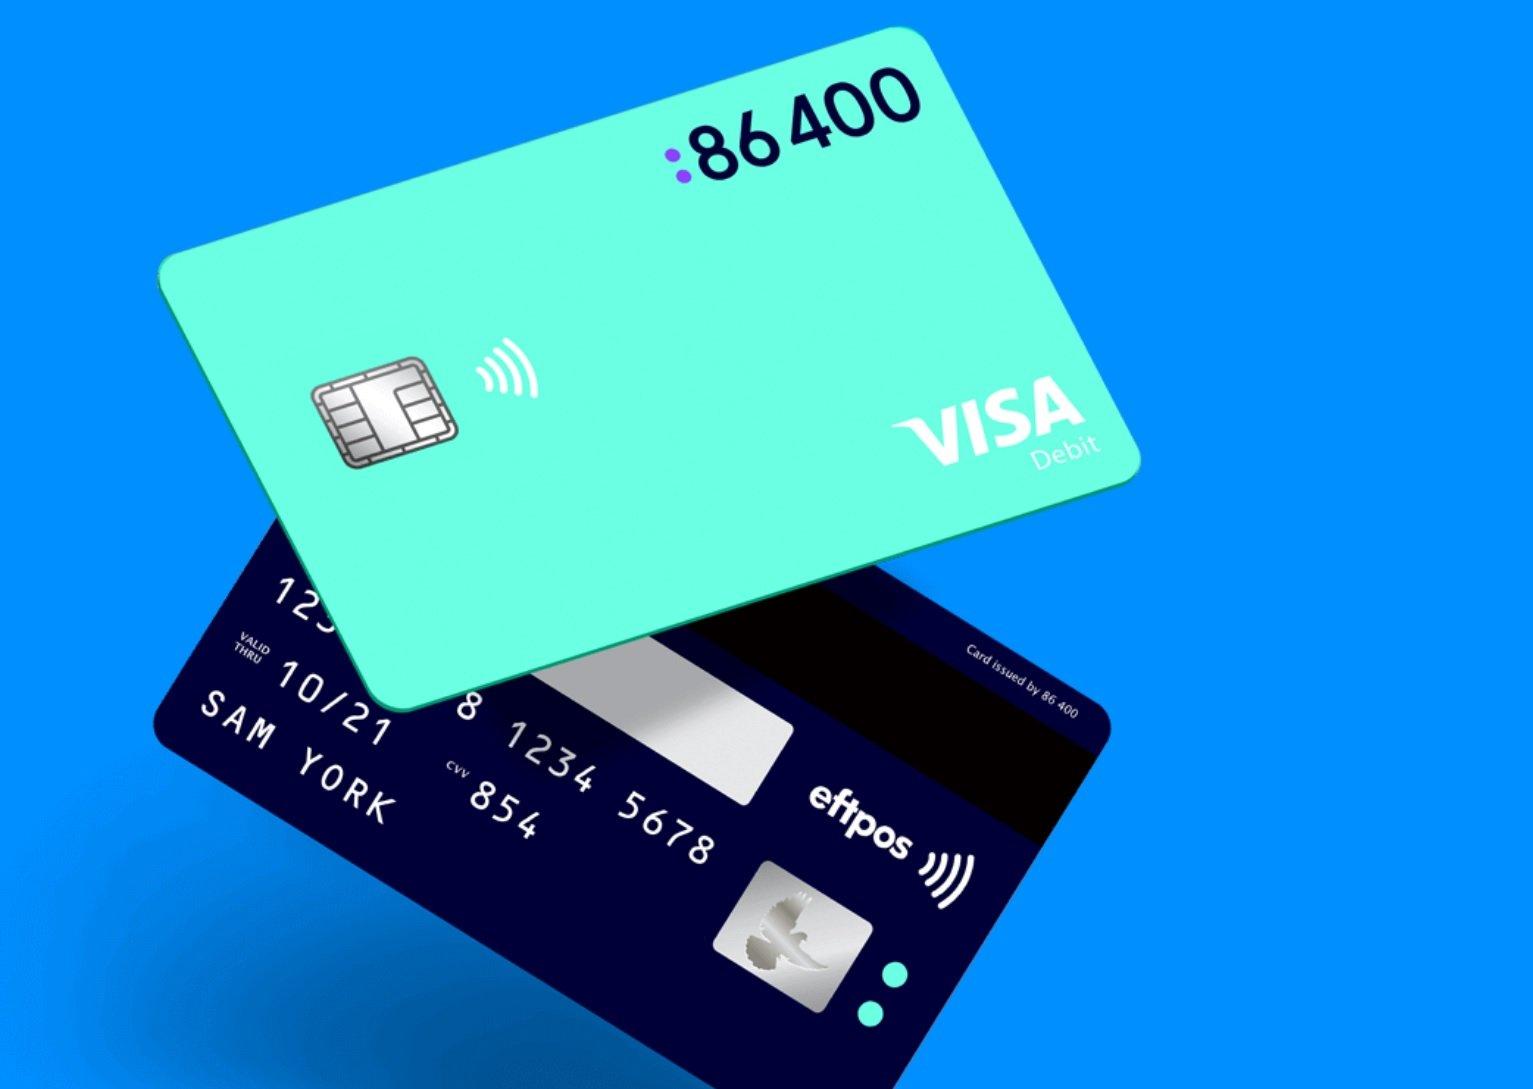 86400-credit-card-neo-bank-australia